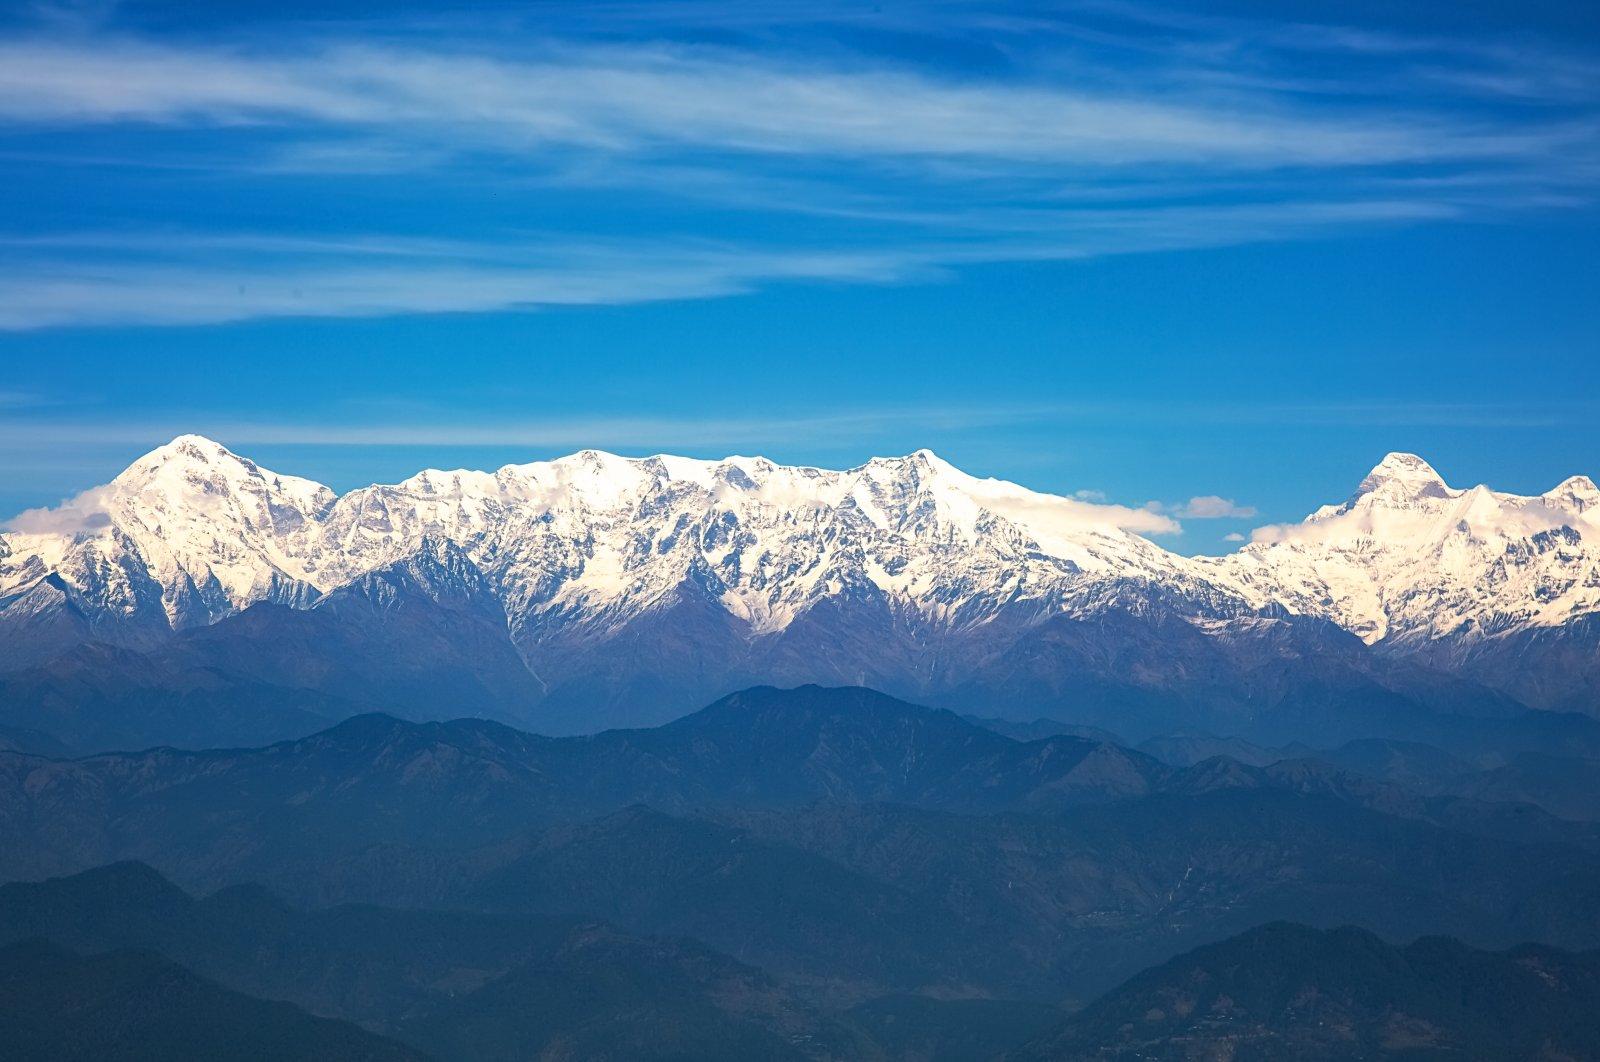 Kumaon Himalayan mountain range with notable peaks like Nandaghunti, Trishul, Nanda Devi as seen from Binsar zero-point Uttarakhand, India. (Shutterstock Photo)